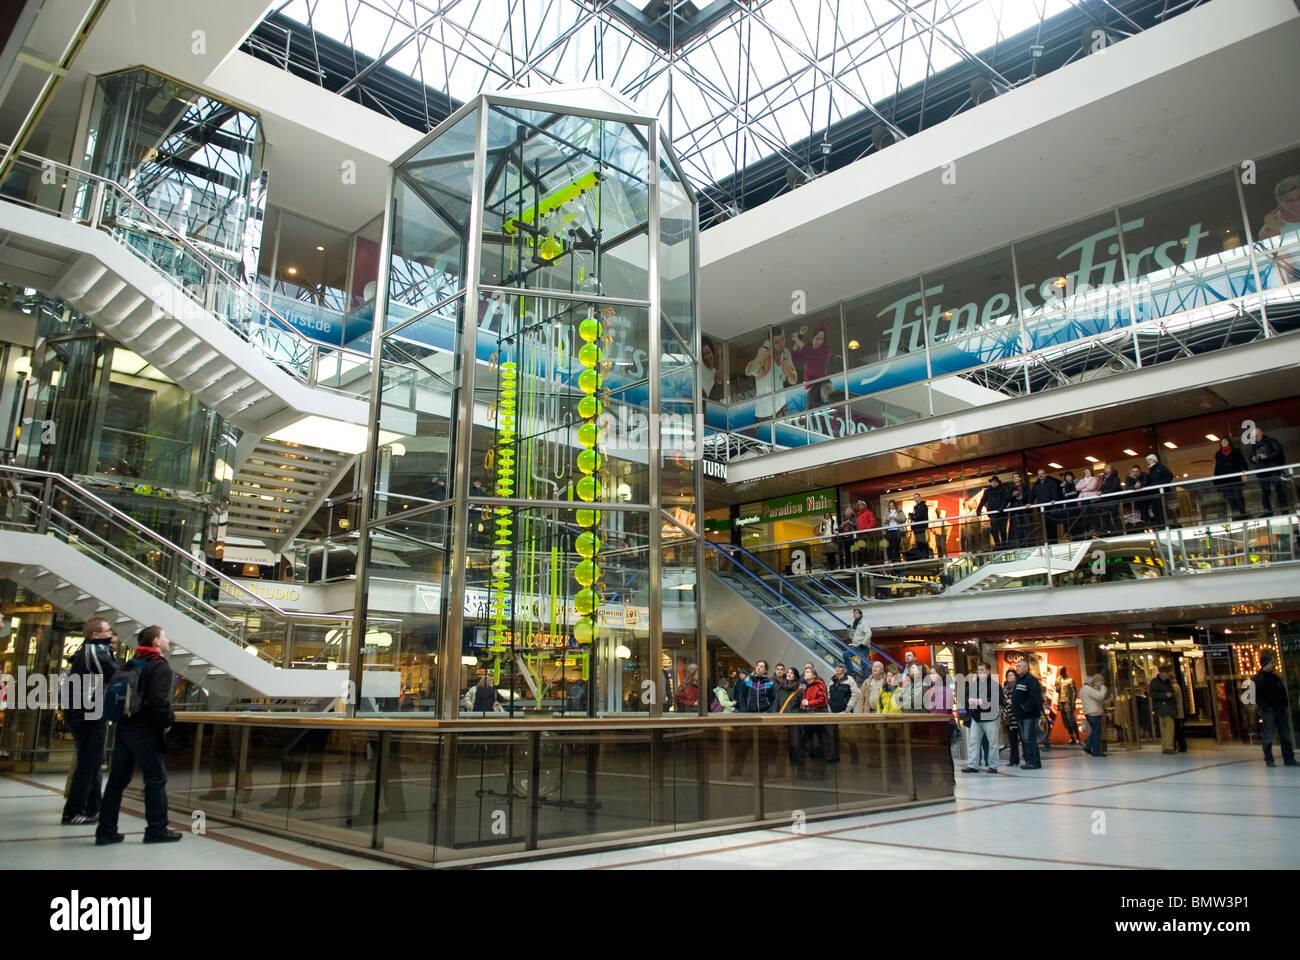 07e40bf16 Tourists inside Europa shopping centre Charlottenburg Berlin city Germany -  Stock Image